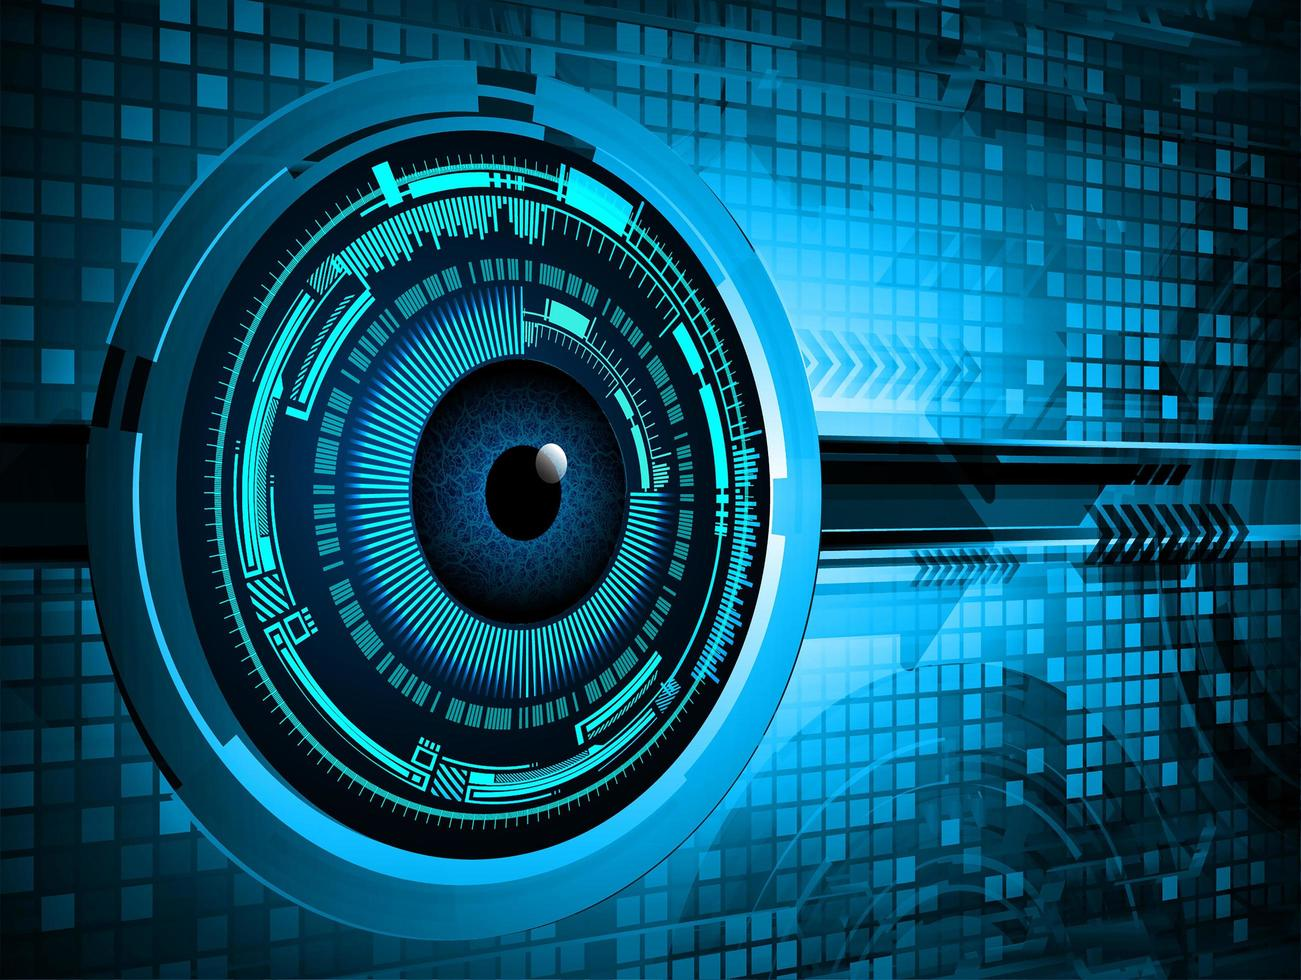 blå ögon cyber krets framtida teknologikoncept vektor